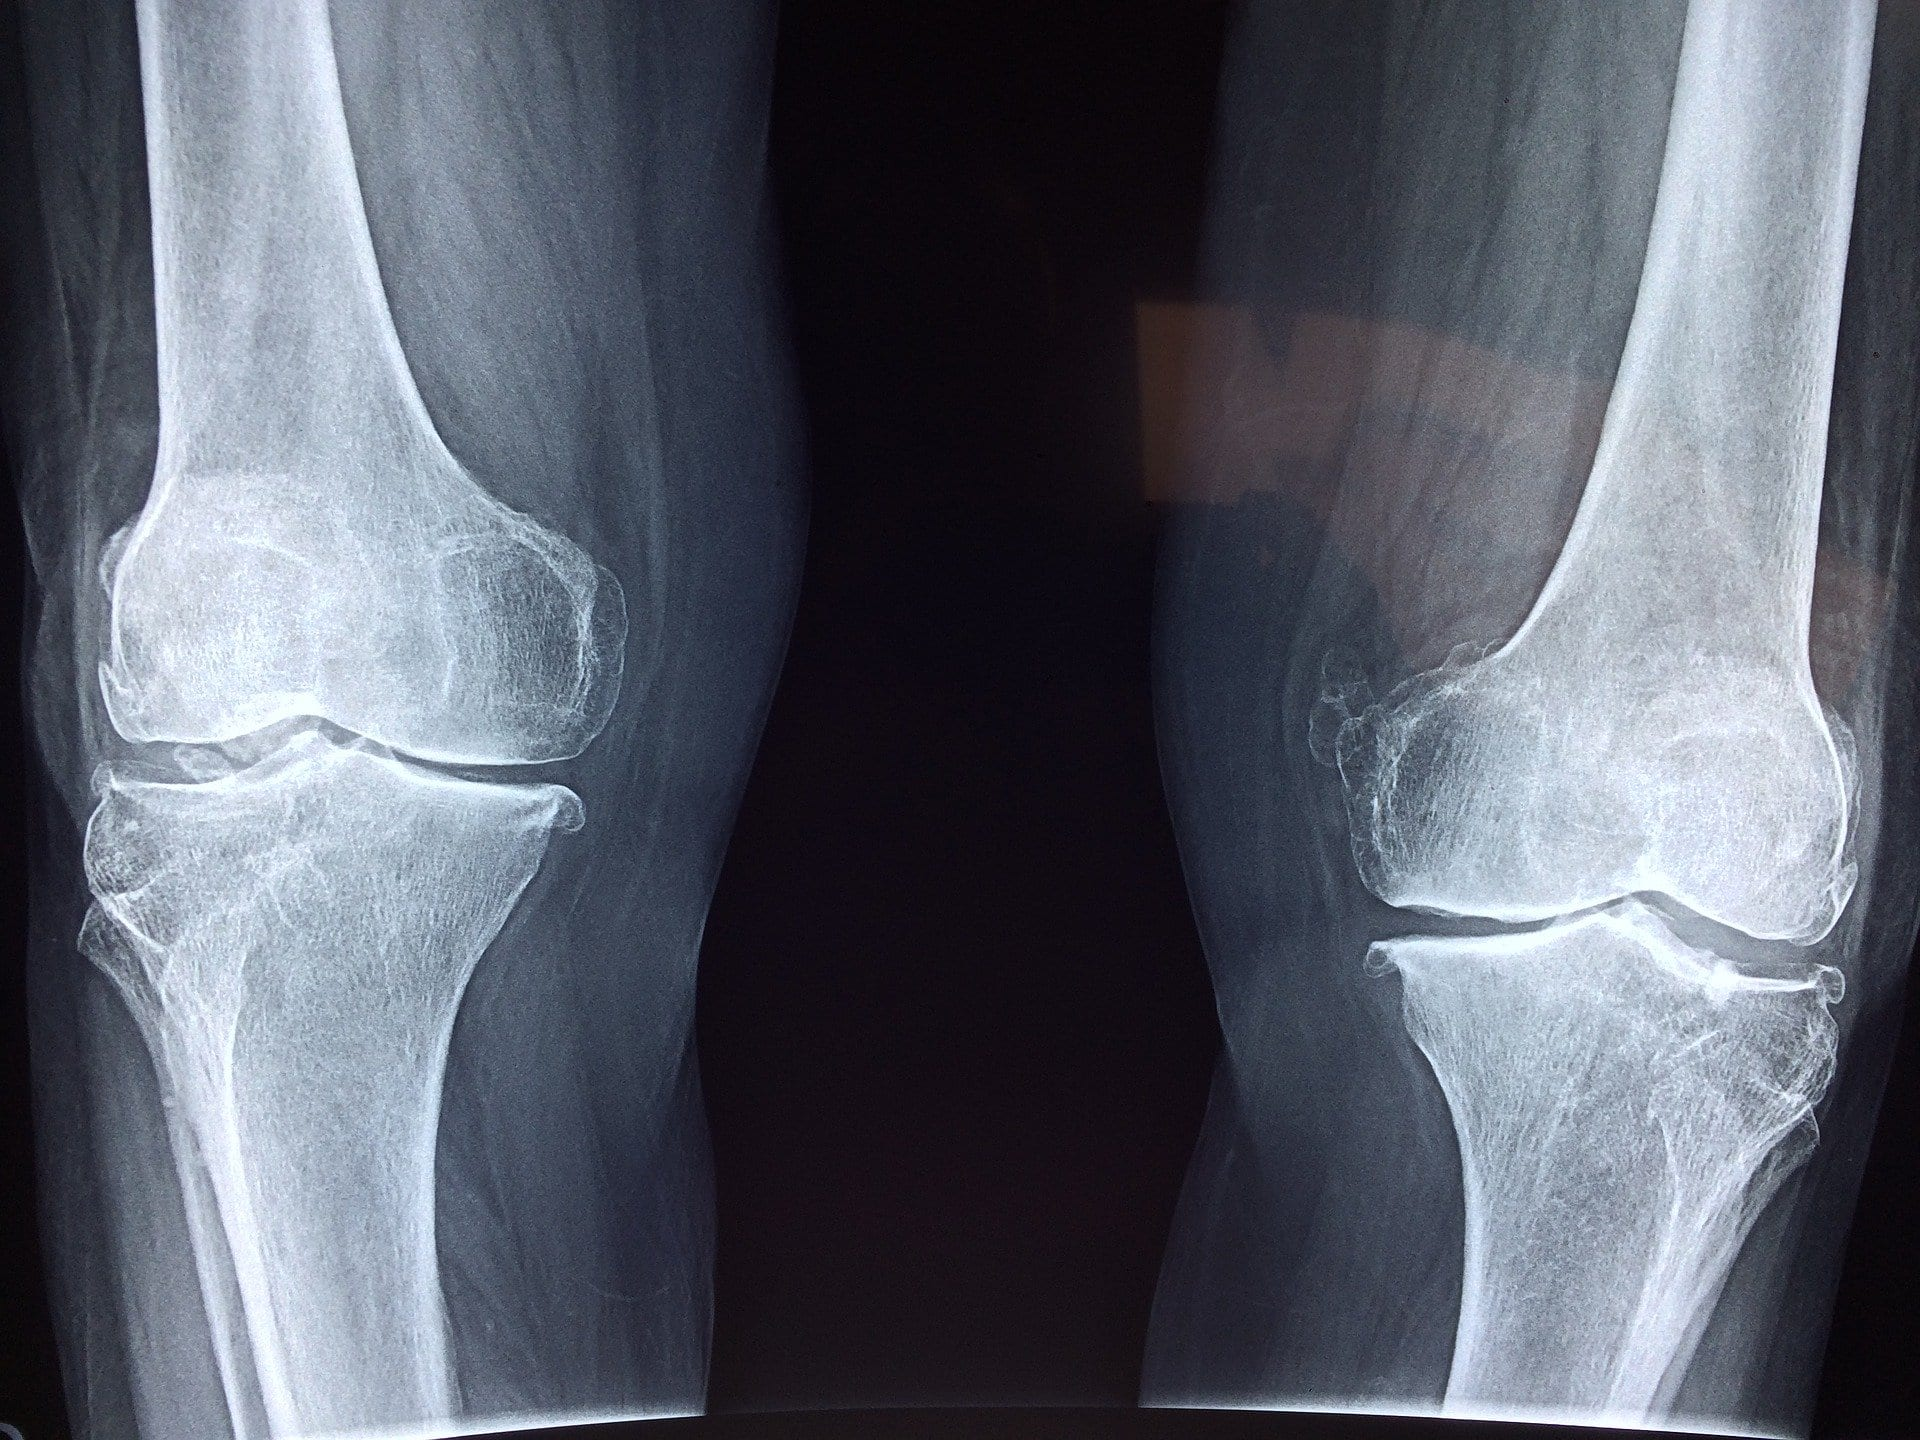 ossa ai raggi x